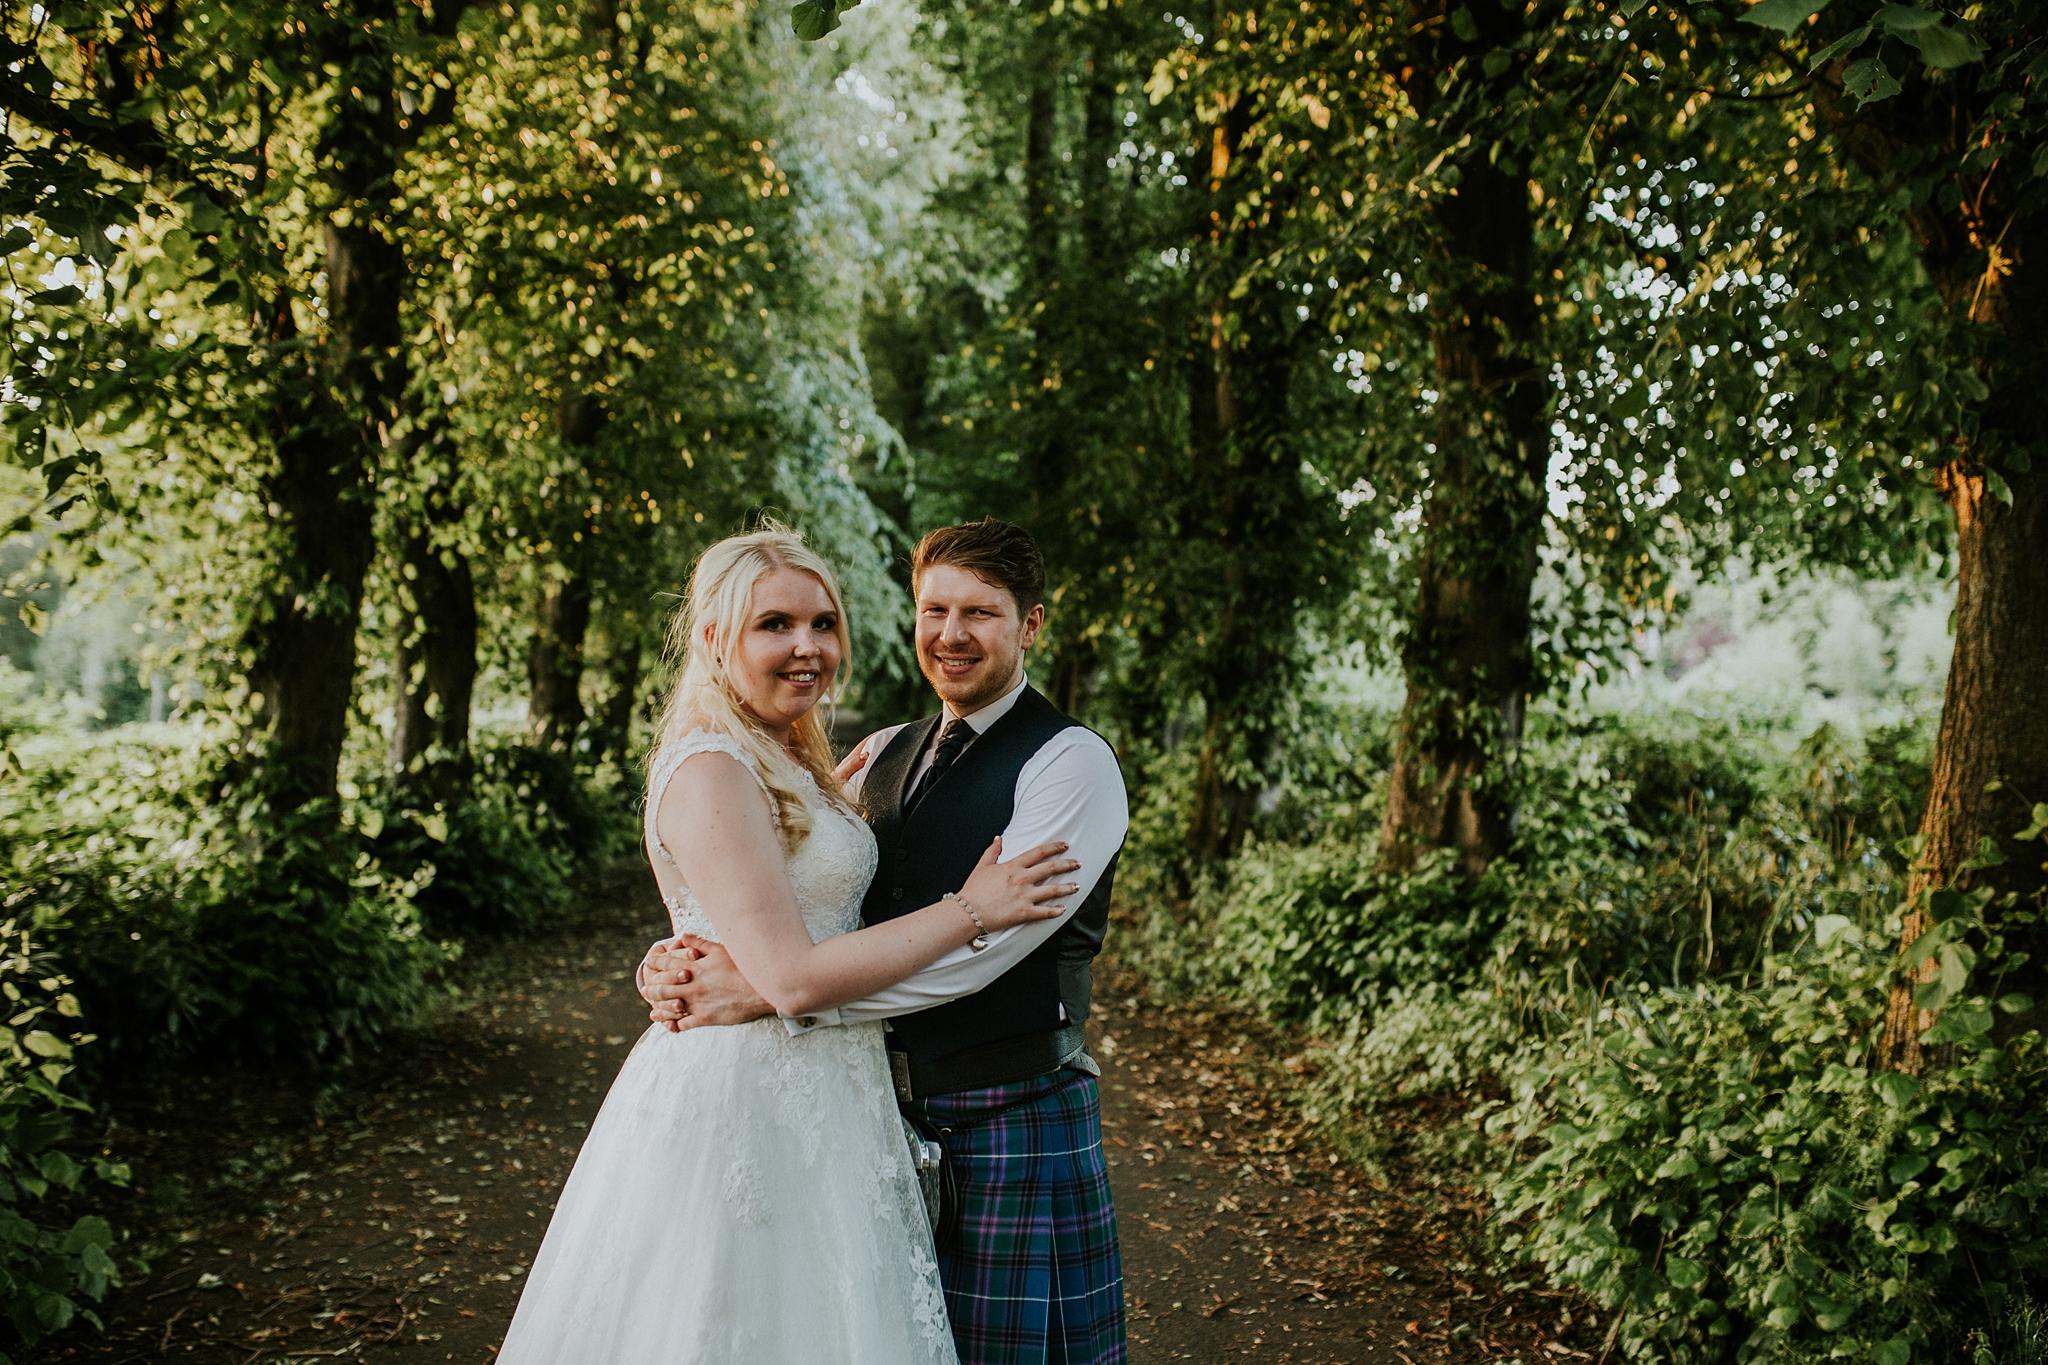 Mark_Alison_Pollockshields_Burgh_Hall_Wedding-46.JPG